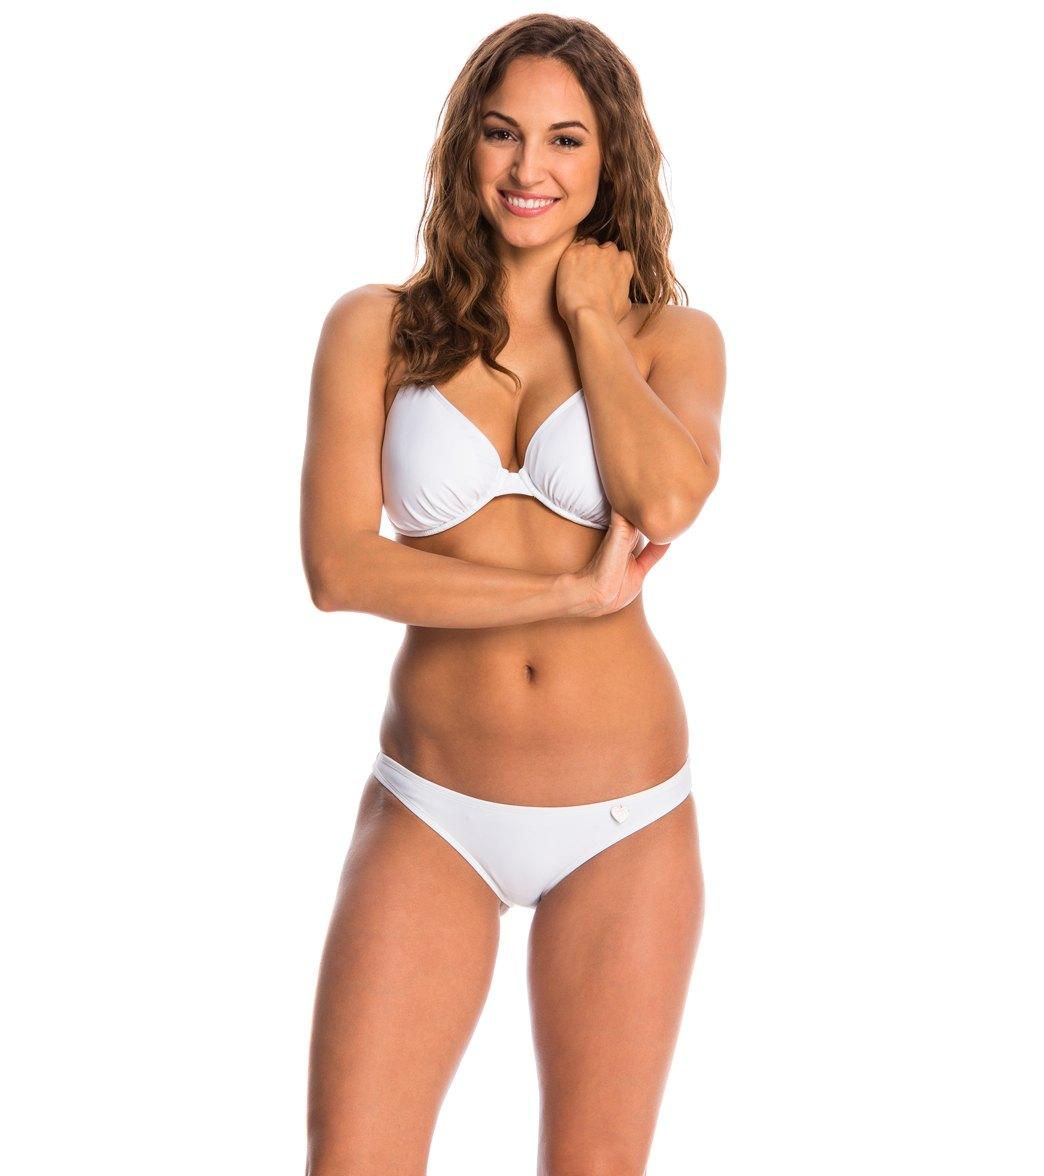 efbb8265acabd Body Glove Swimwear SmoothiesSolo D DD E F Cup Underwire Bikini Top ...